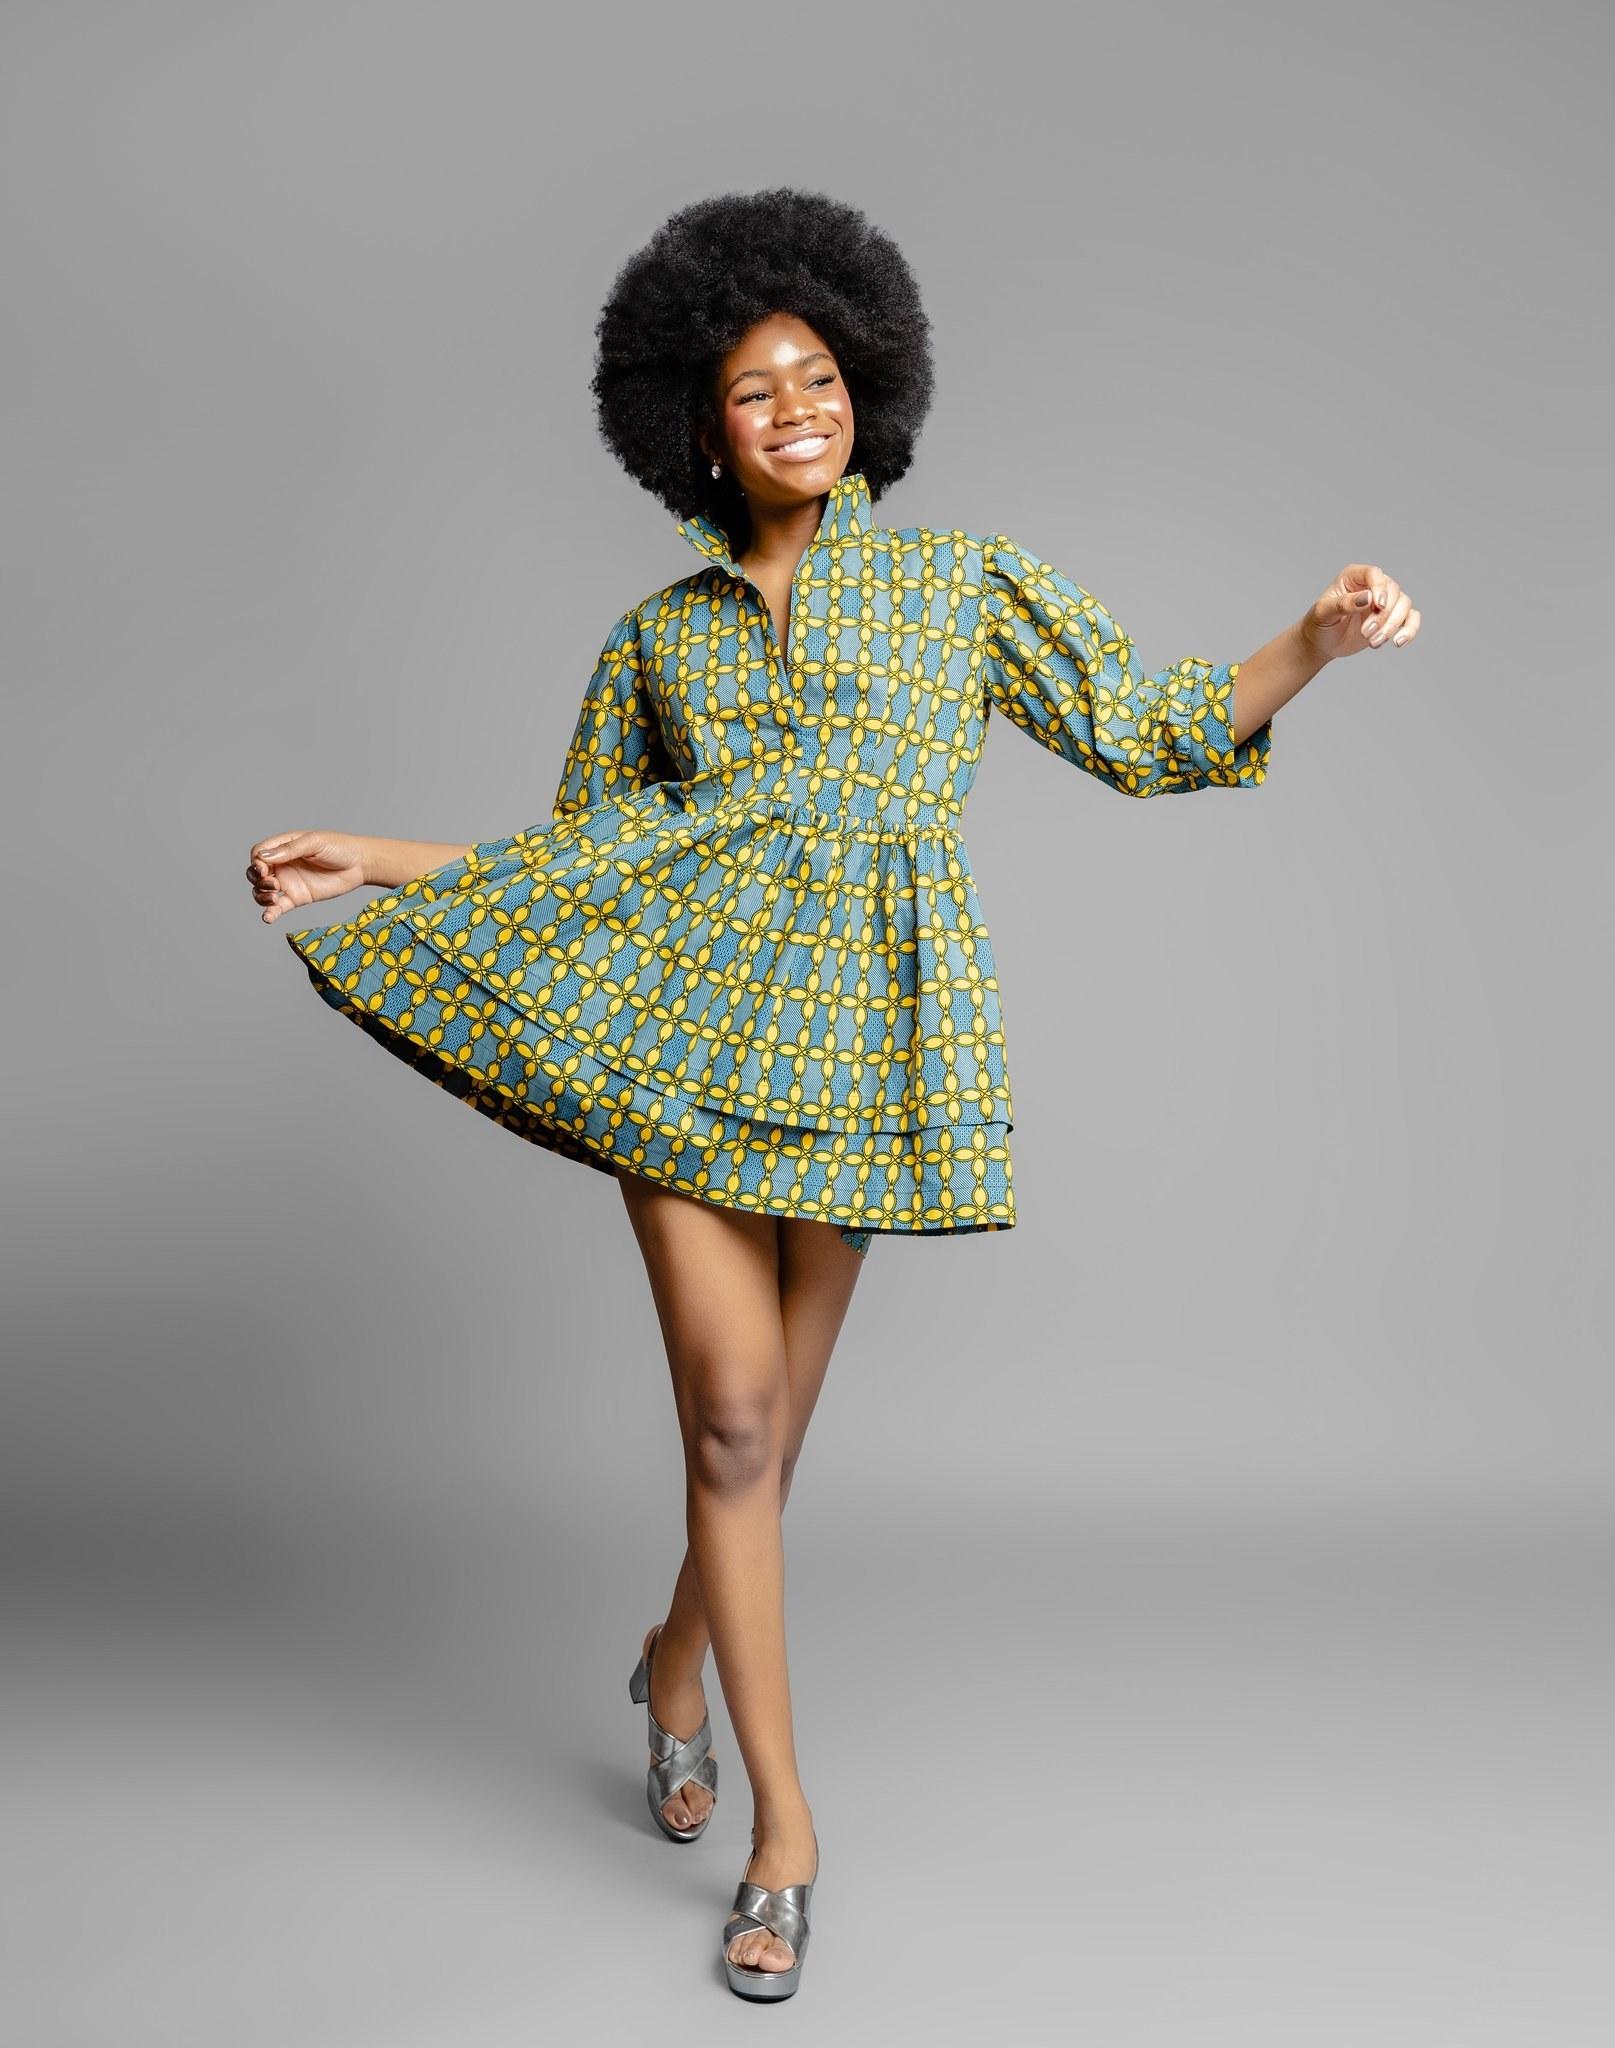 model wearing the 3/4-sleeve green and yellow mini dress